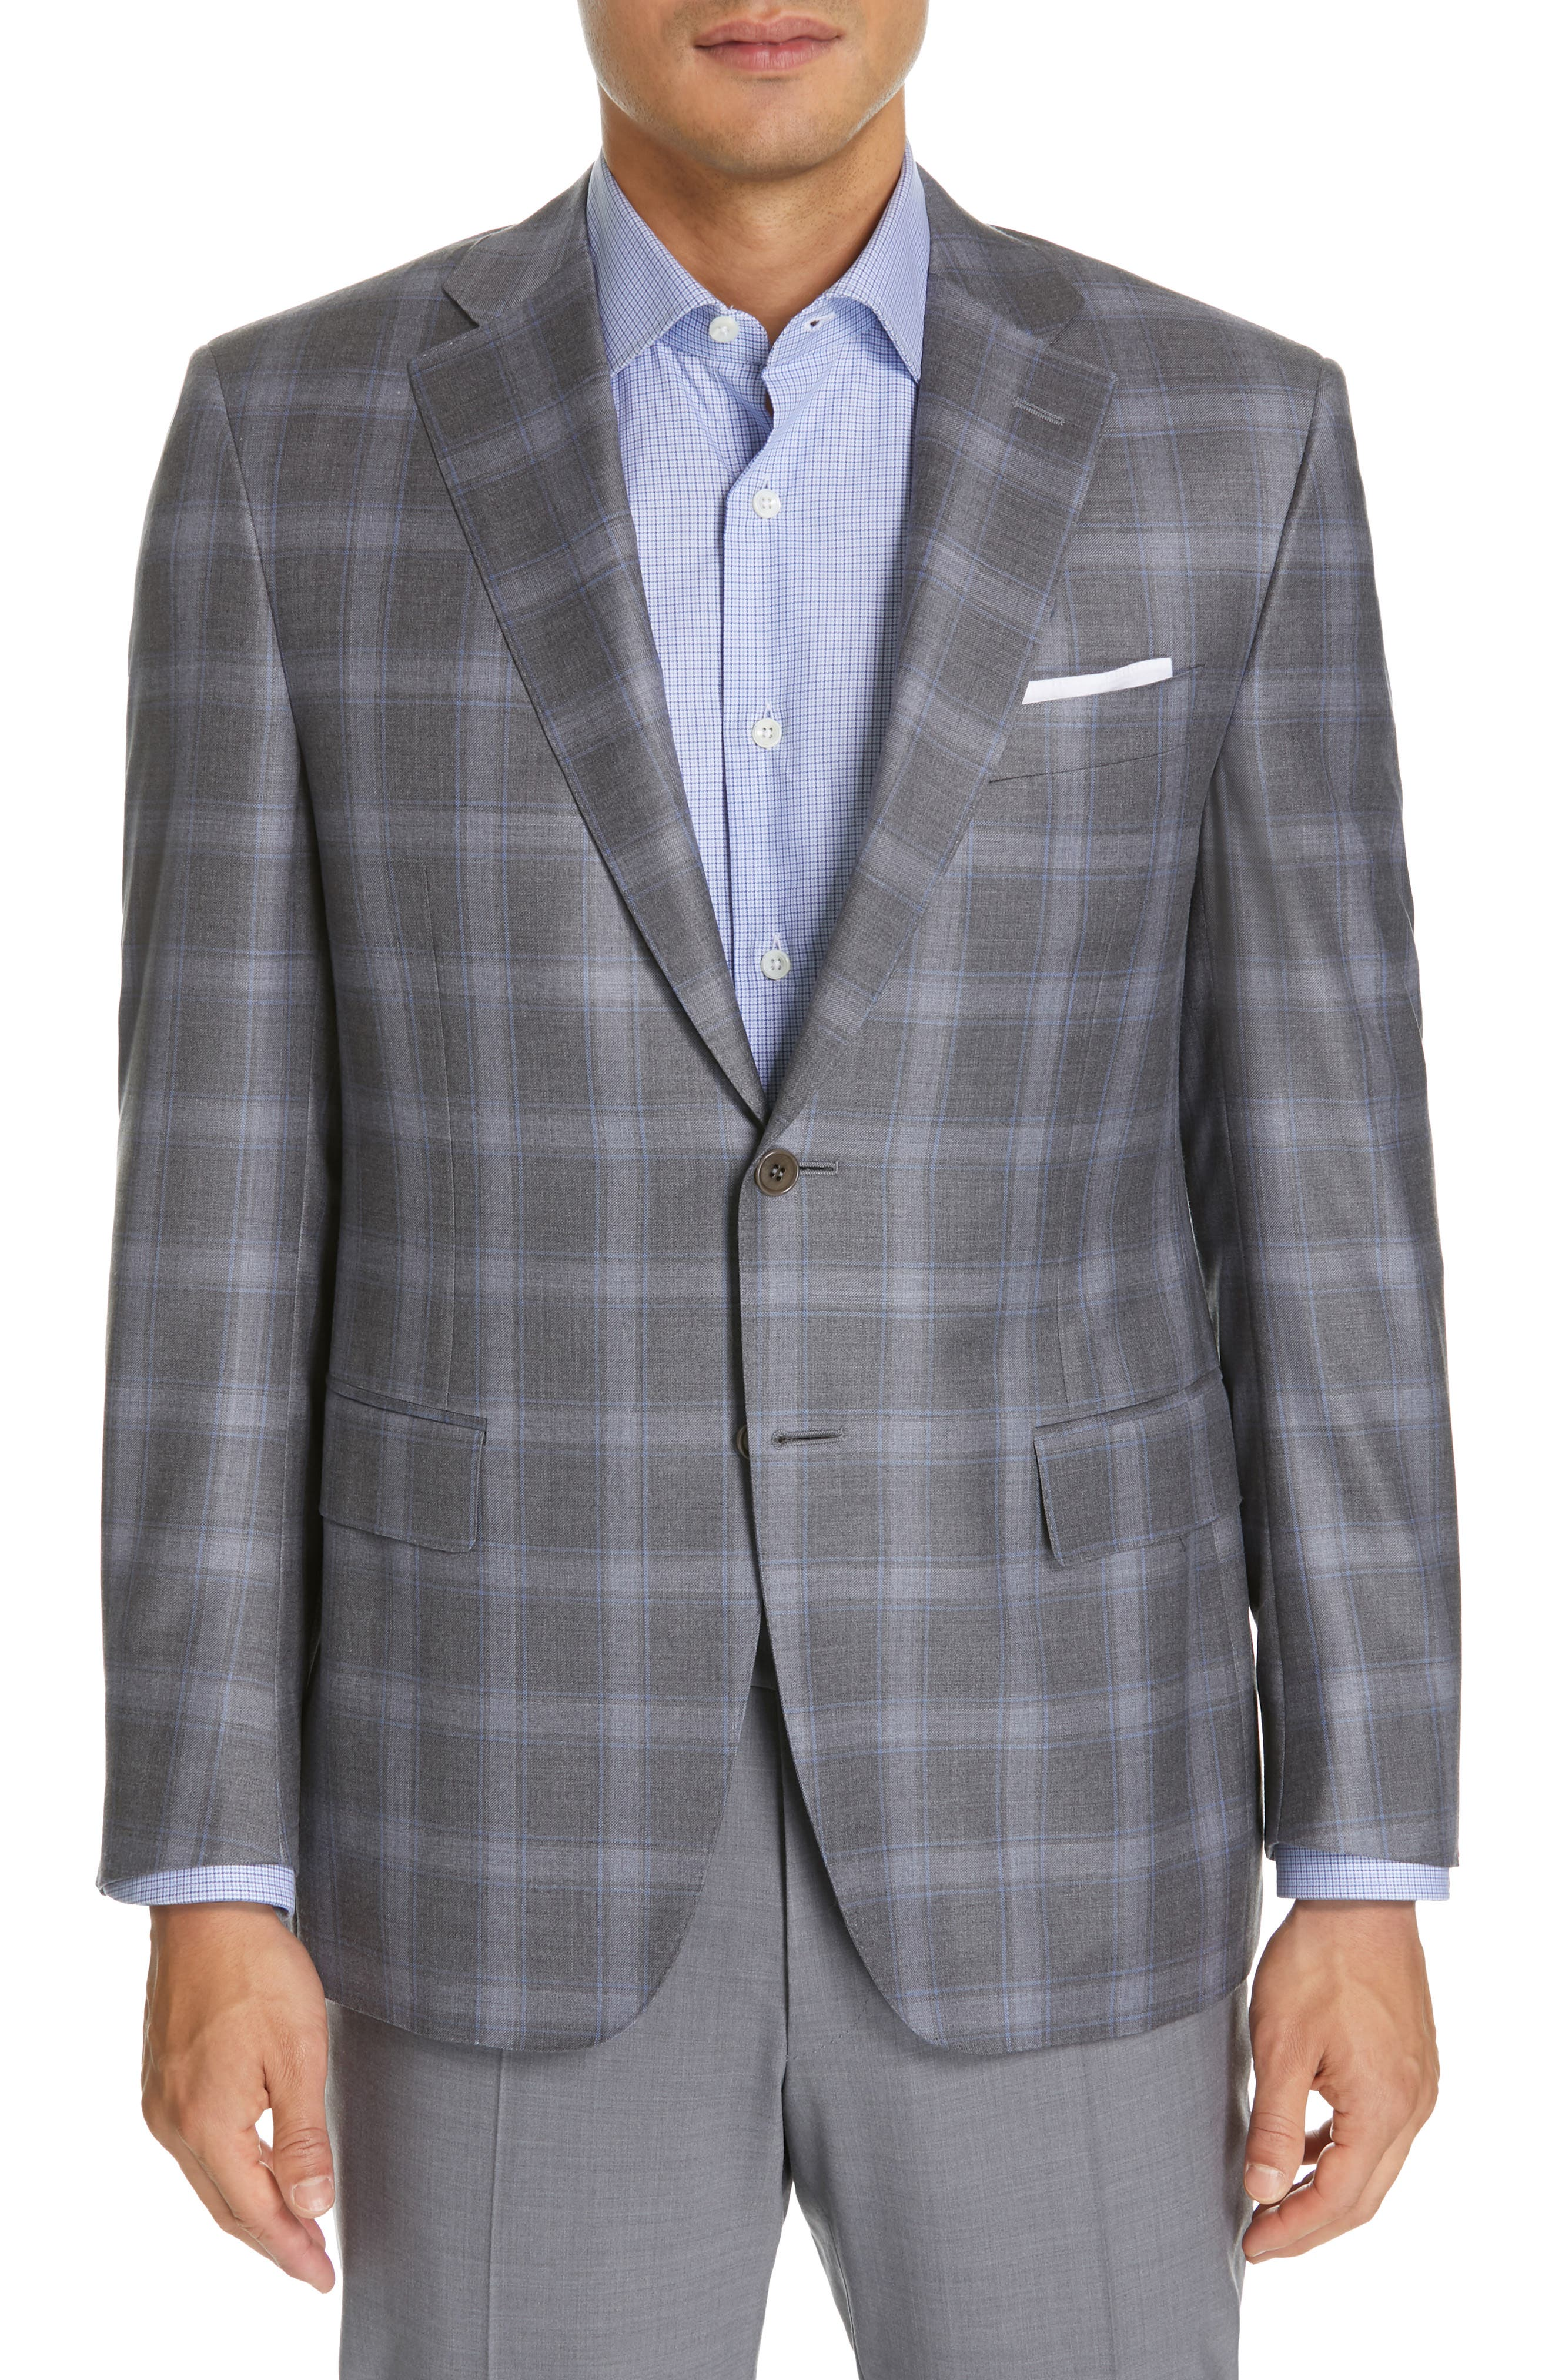 Sienna Classic Fit Plaid Wool Sport Coat,                             Main thumbnail 1, color,                             GREY